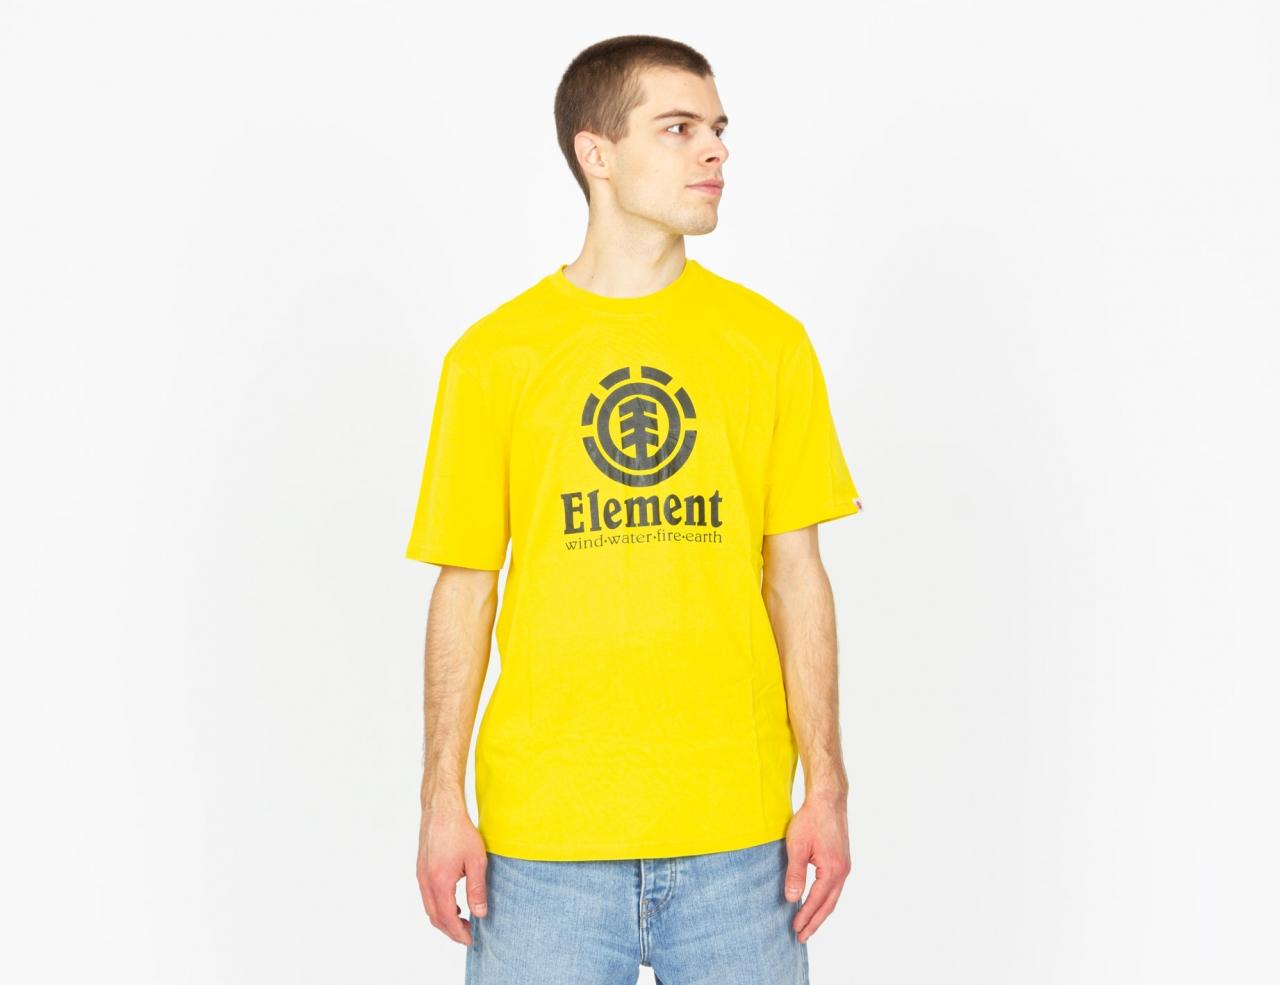 Element Element Vertical T-Shirt - Bright Yellow